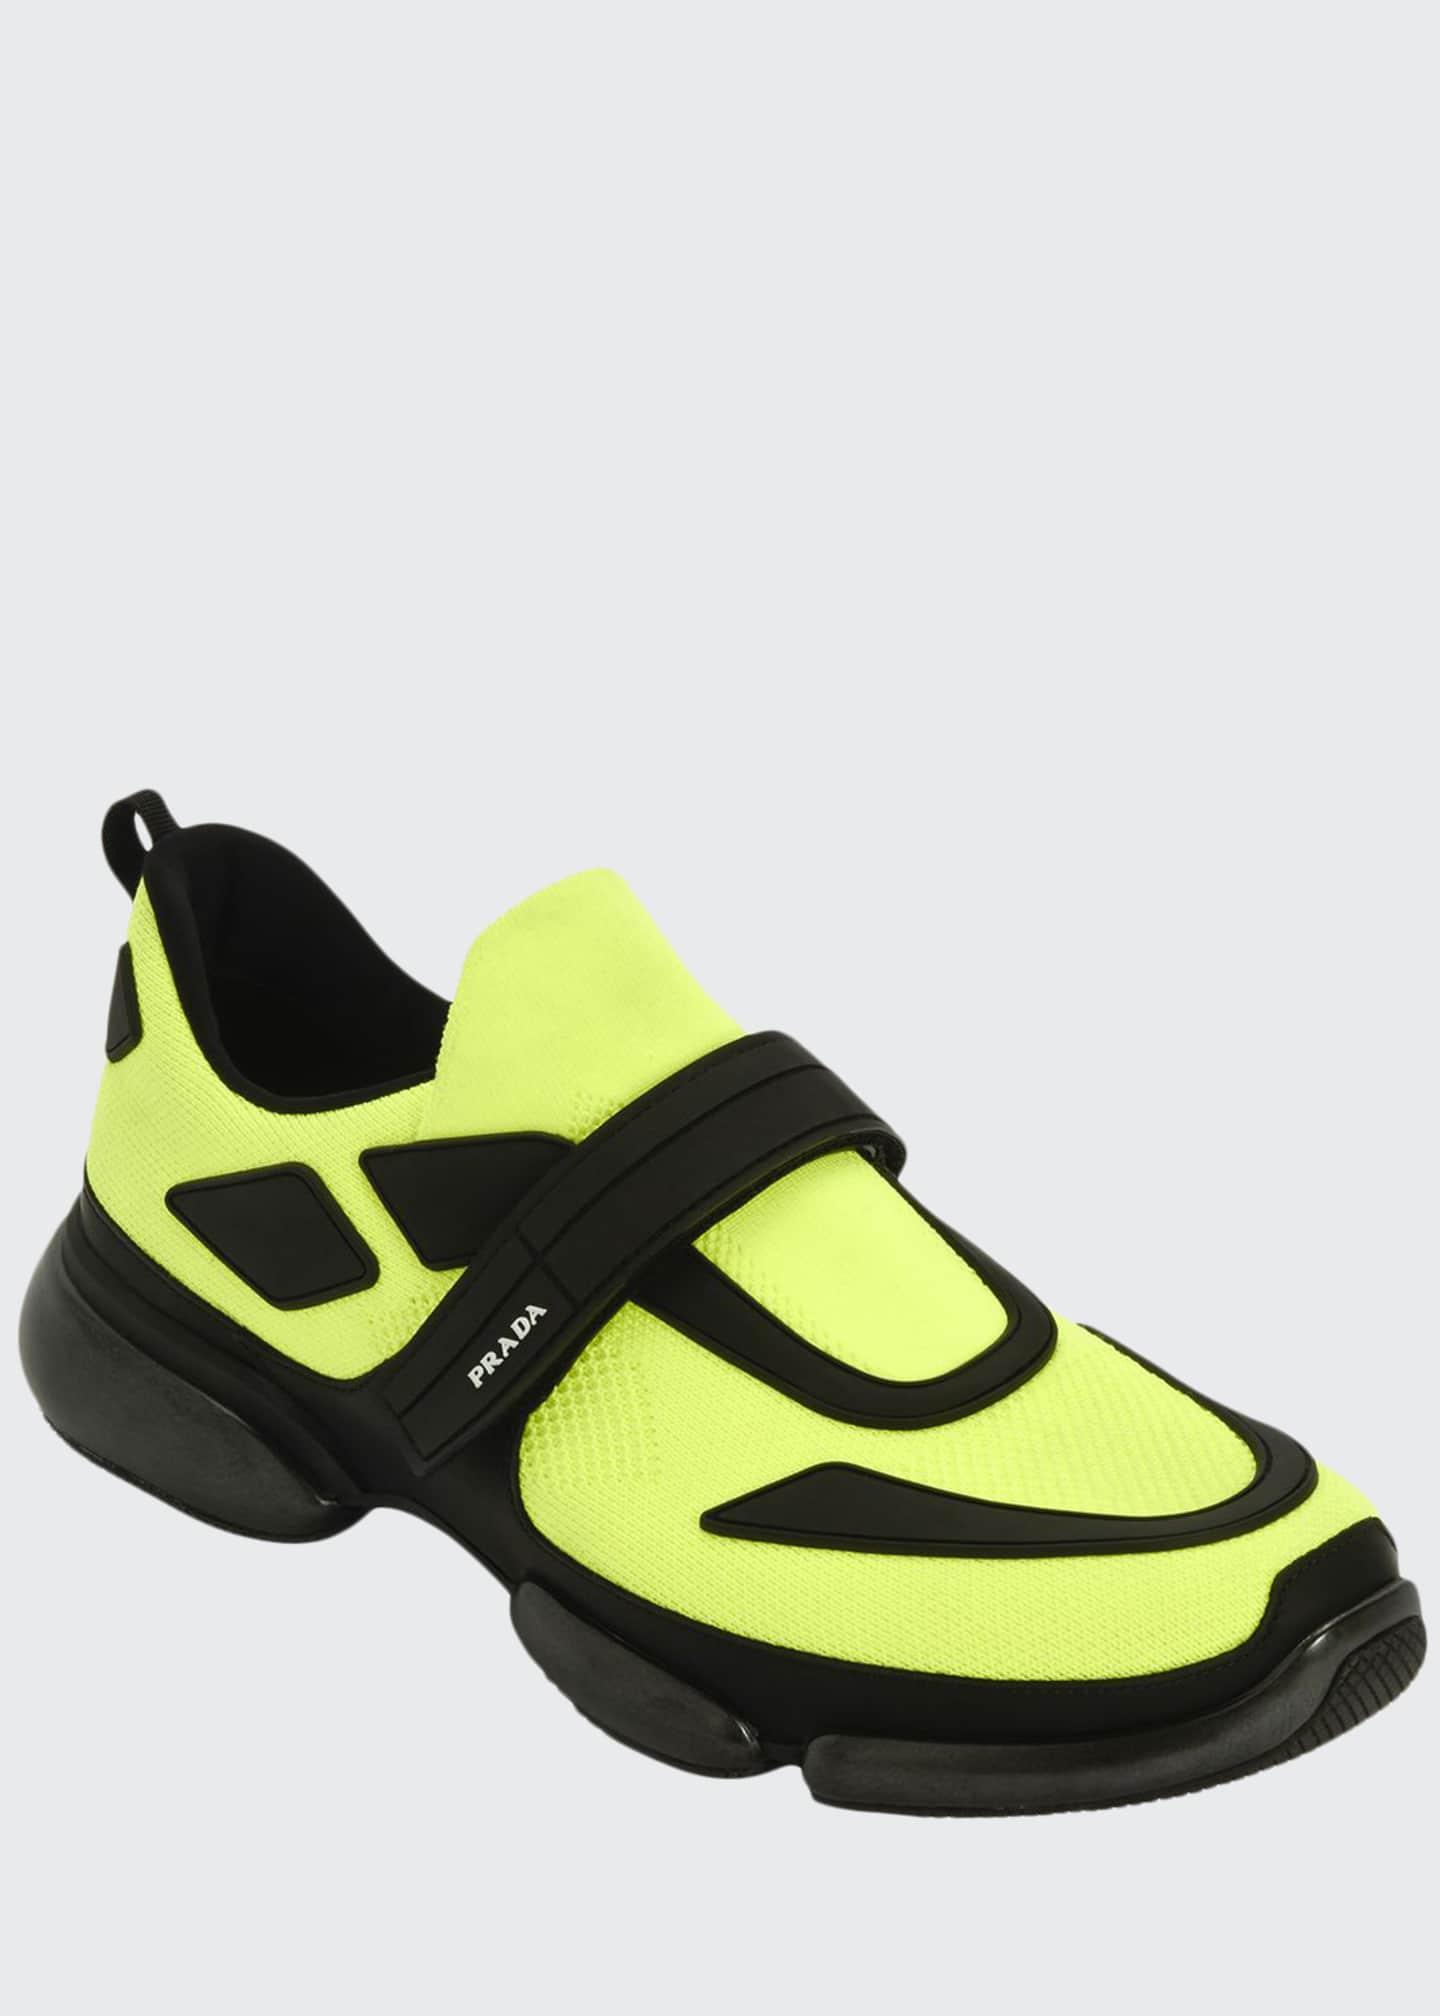 Prada Men's Cloudbust Knit Running Sneakers with Single